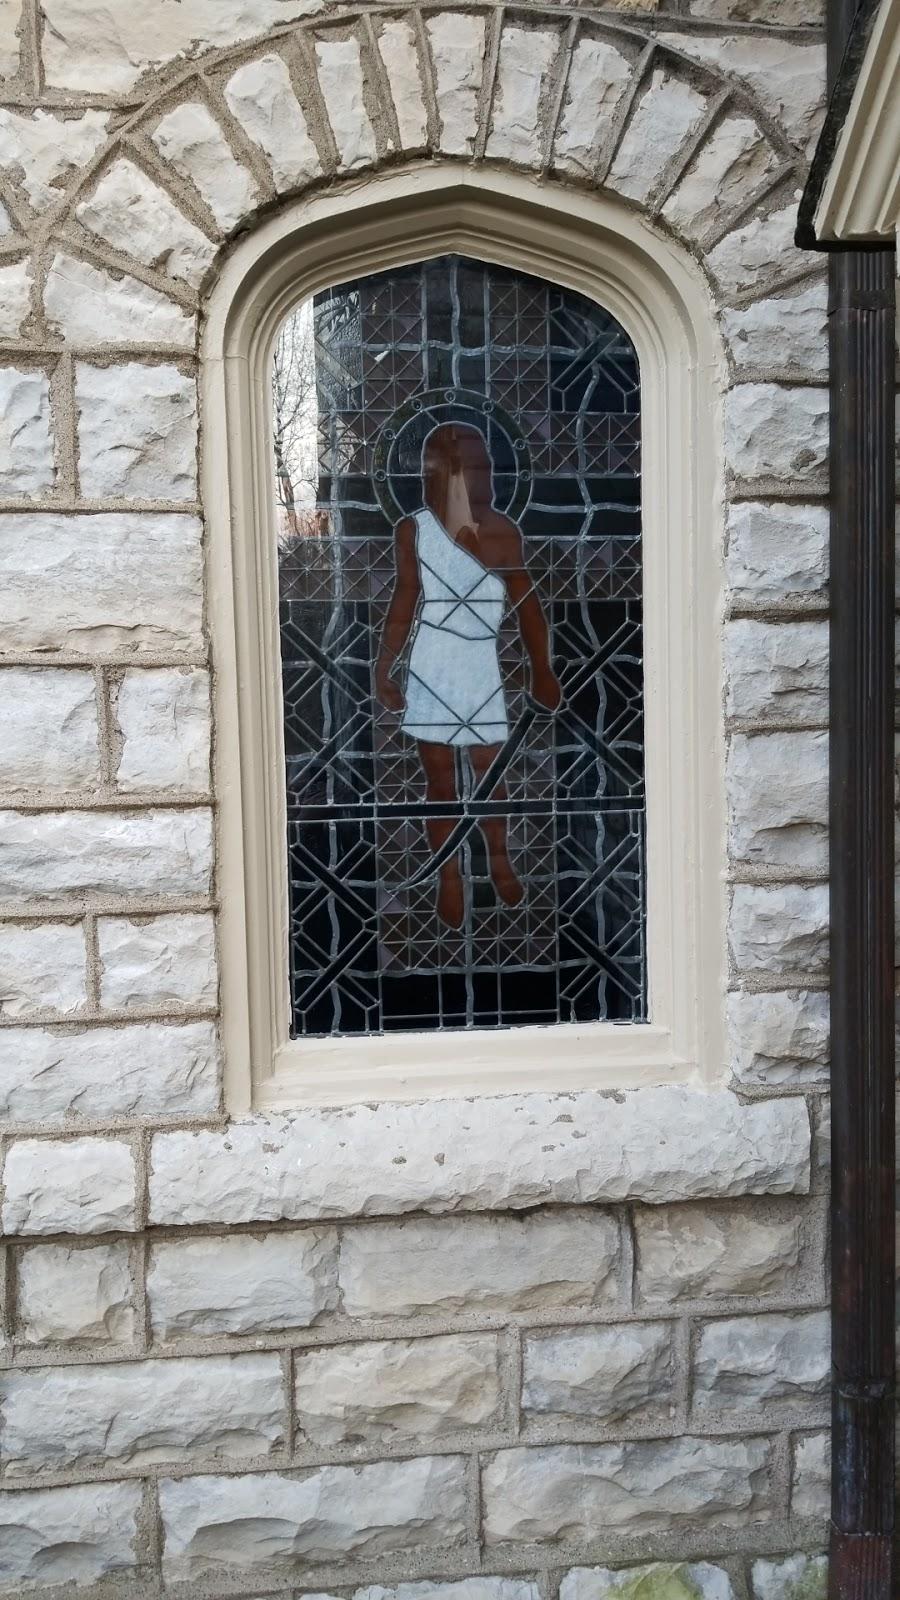 St Lukes Episcopal Church - church  | Photo 9 of 10 | Address: 1206 Maple Ln, Louisville, KY 40223, USA | Phone: (502) 245-8827